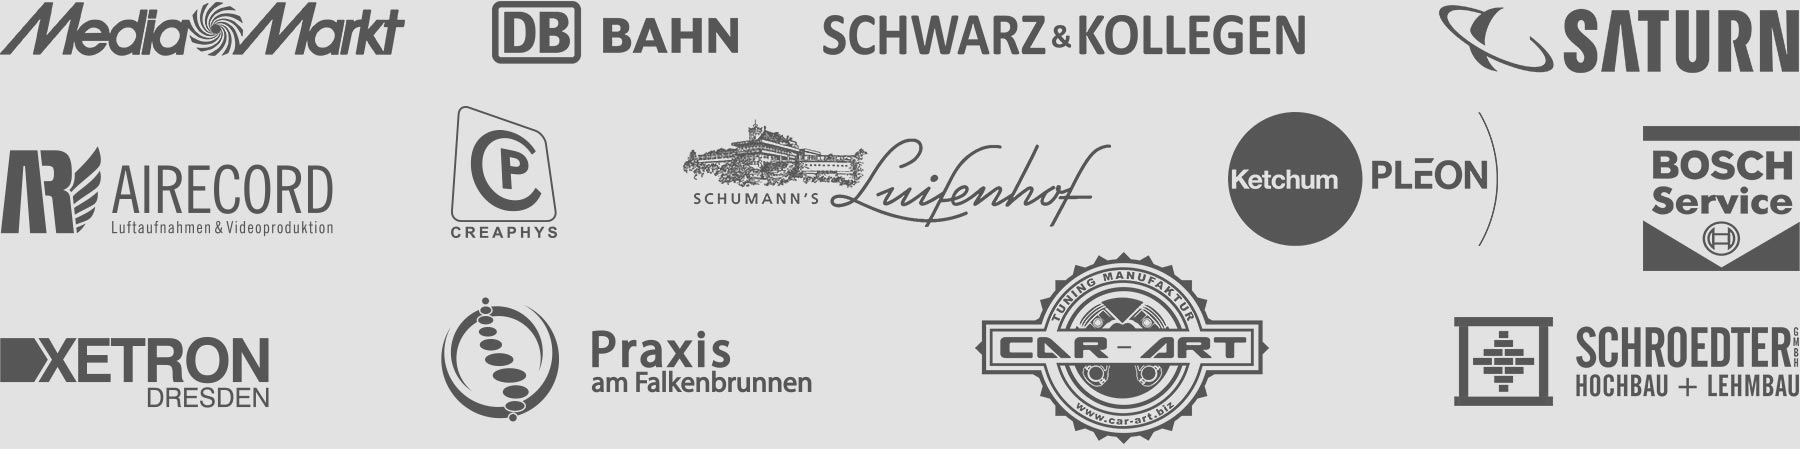 Mediamarkt, Saturn, Bosch, Airecord, Xetron, Car-Art, Creaphys, sim4tec, Luisenhof, Schwarz & Kollegen